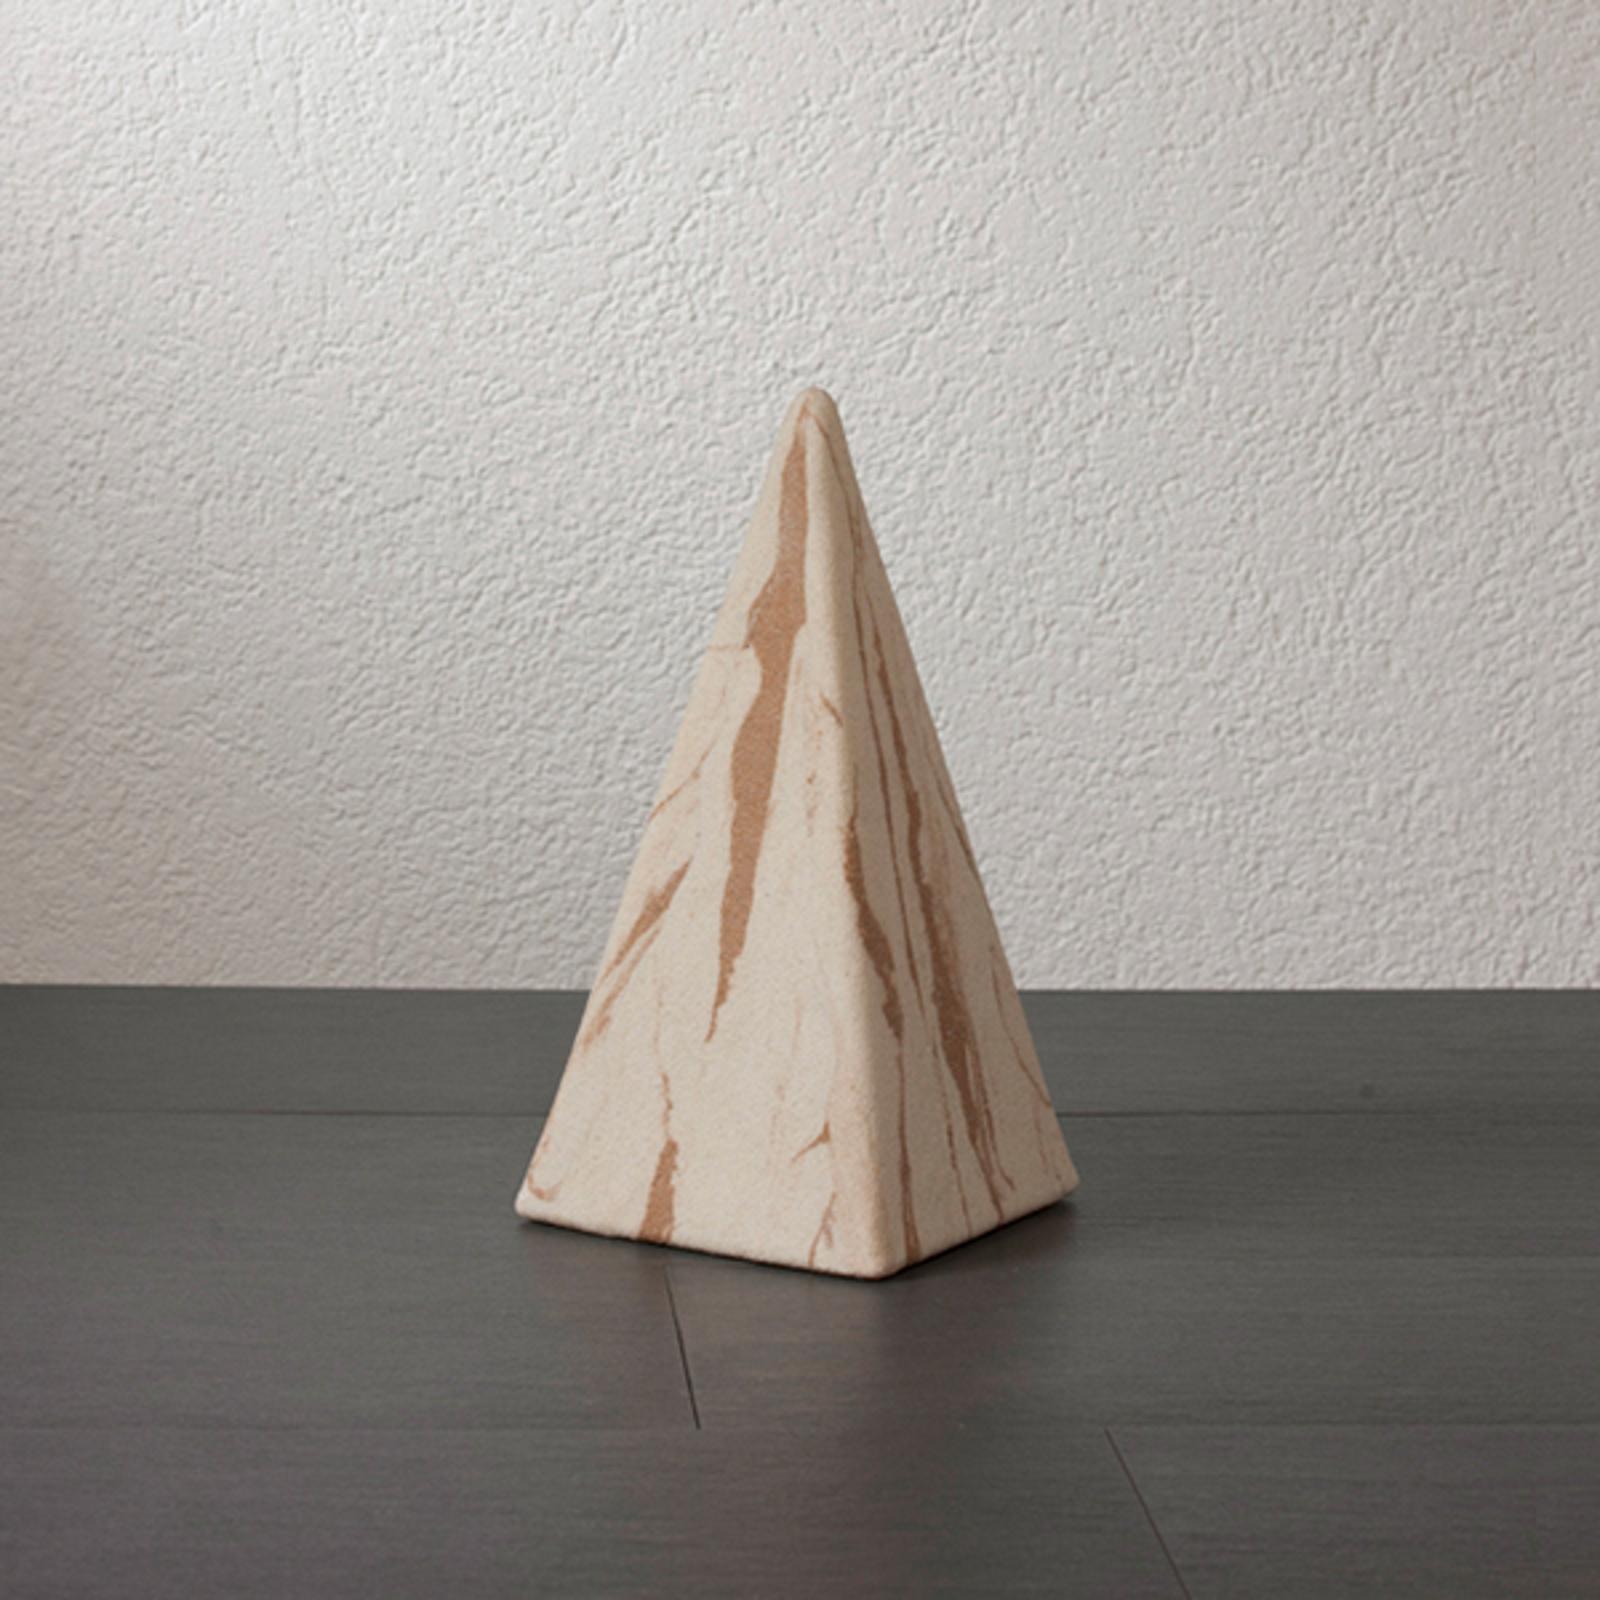 Sahara pyramide med gummitilkobling 36cm